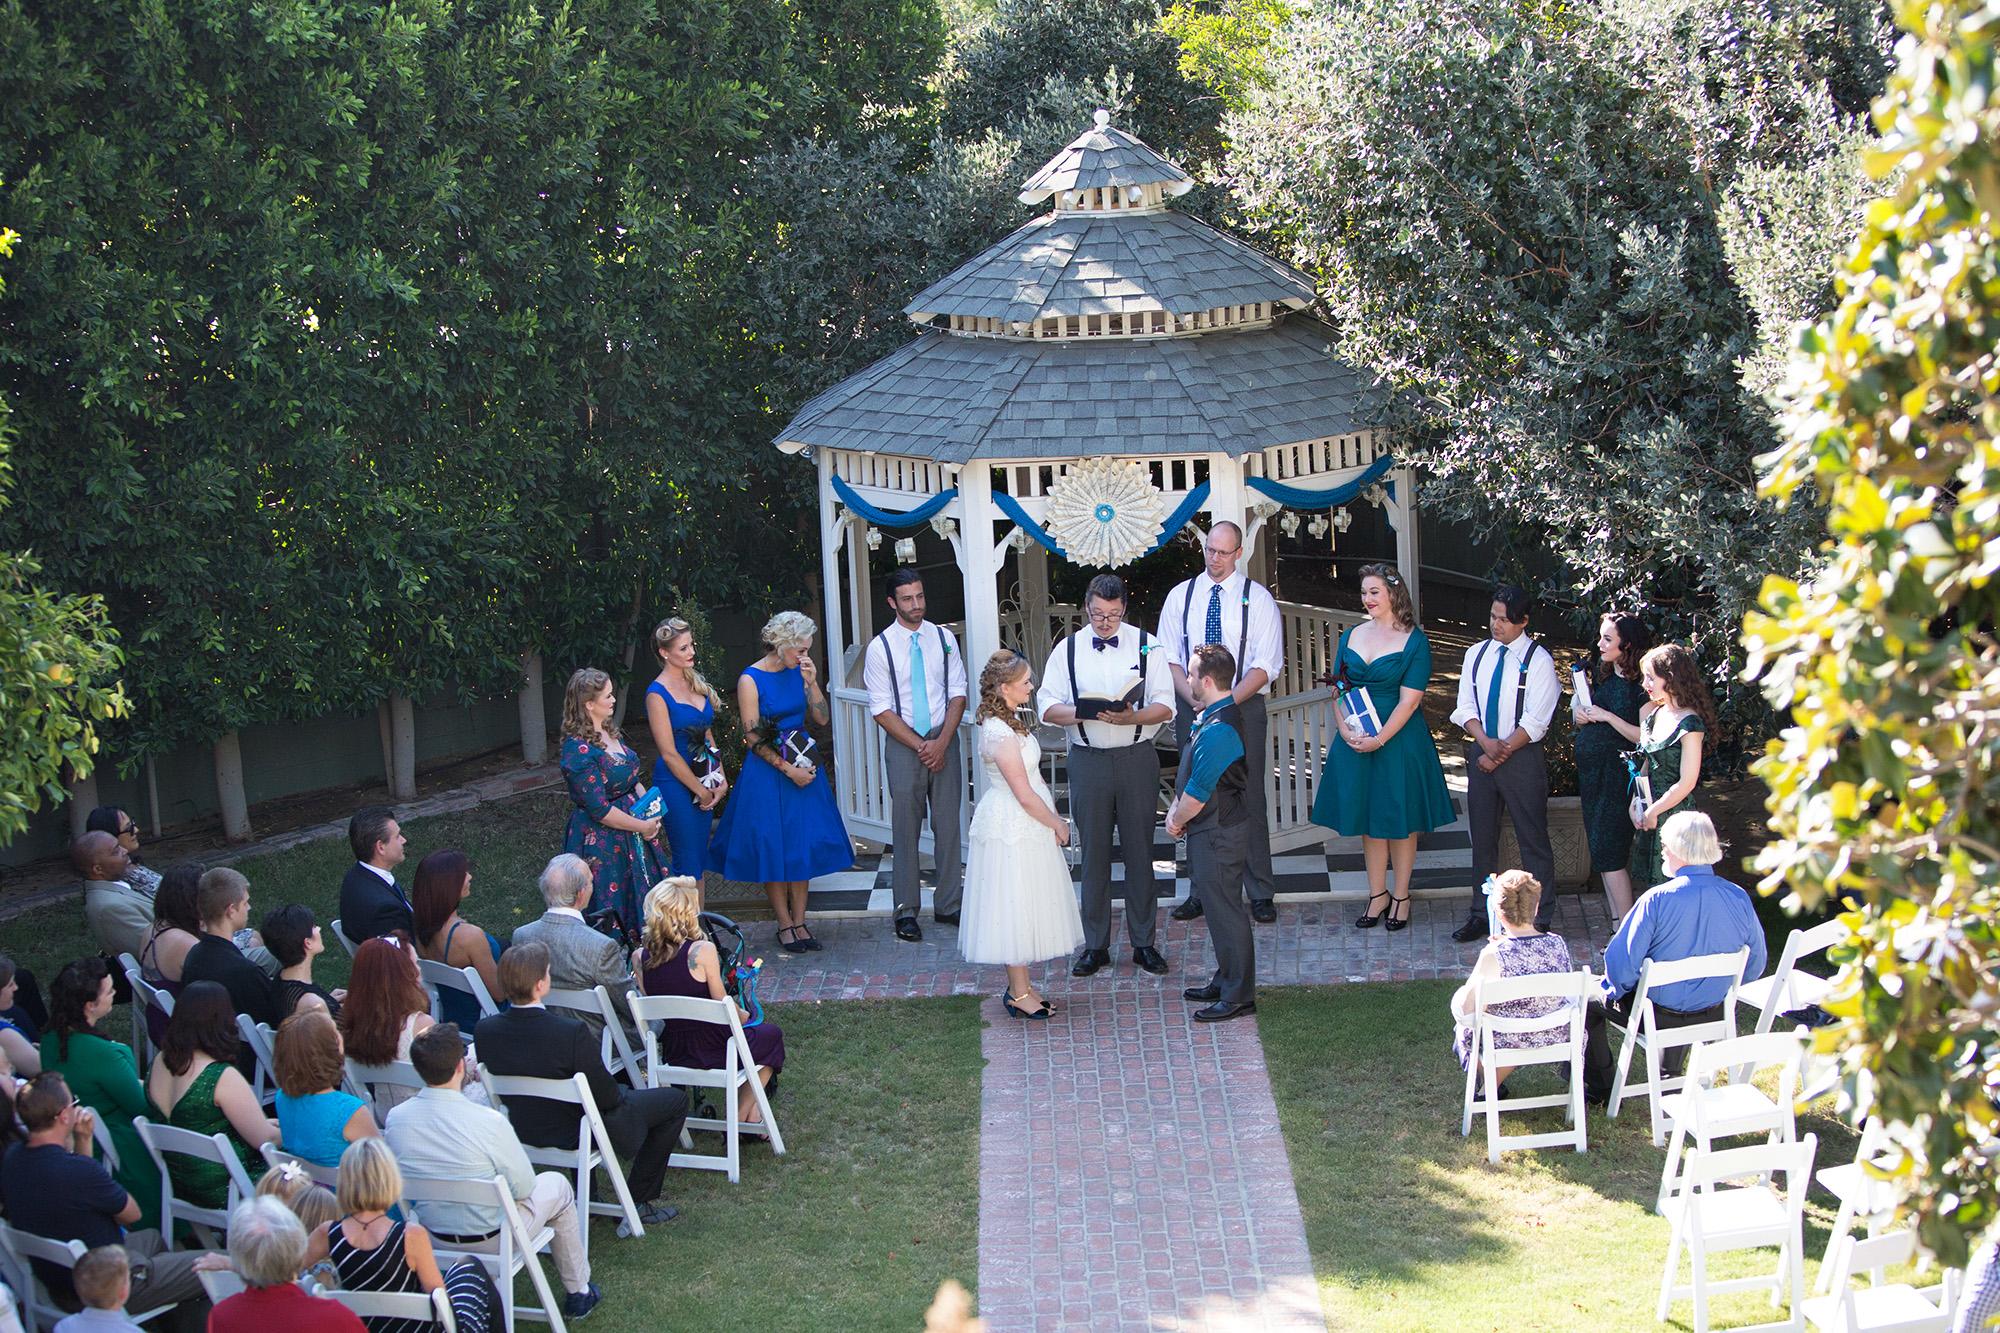 christmas-house-weddings-receptions-carrie-vines-296.jpg